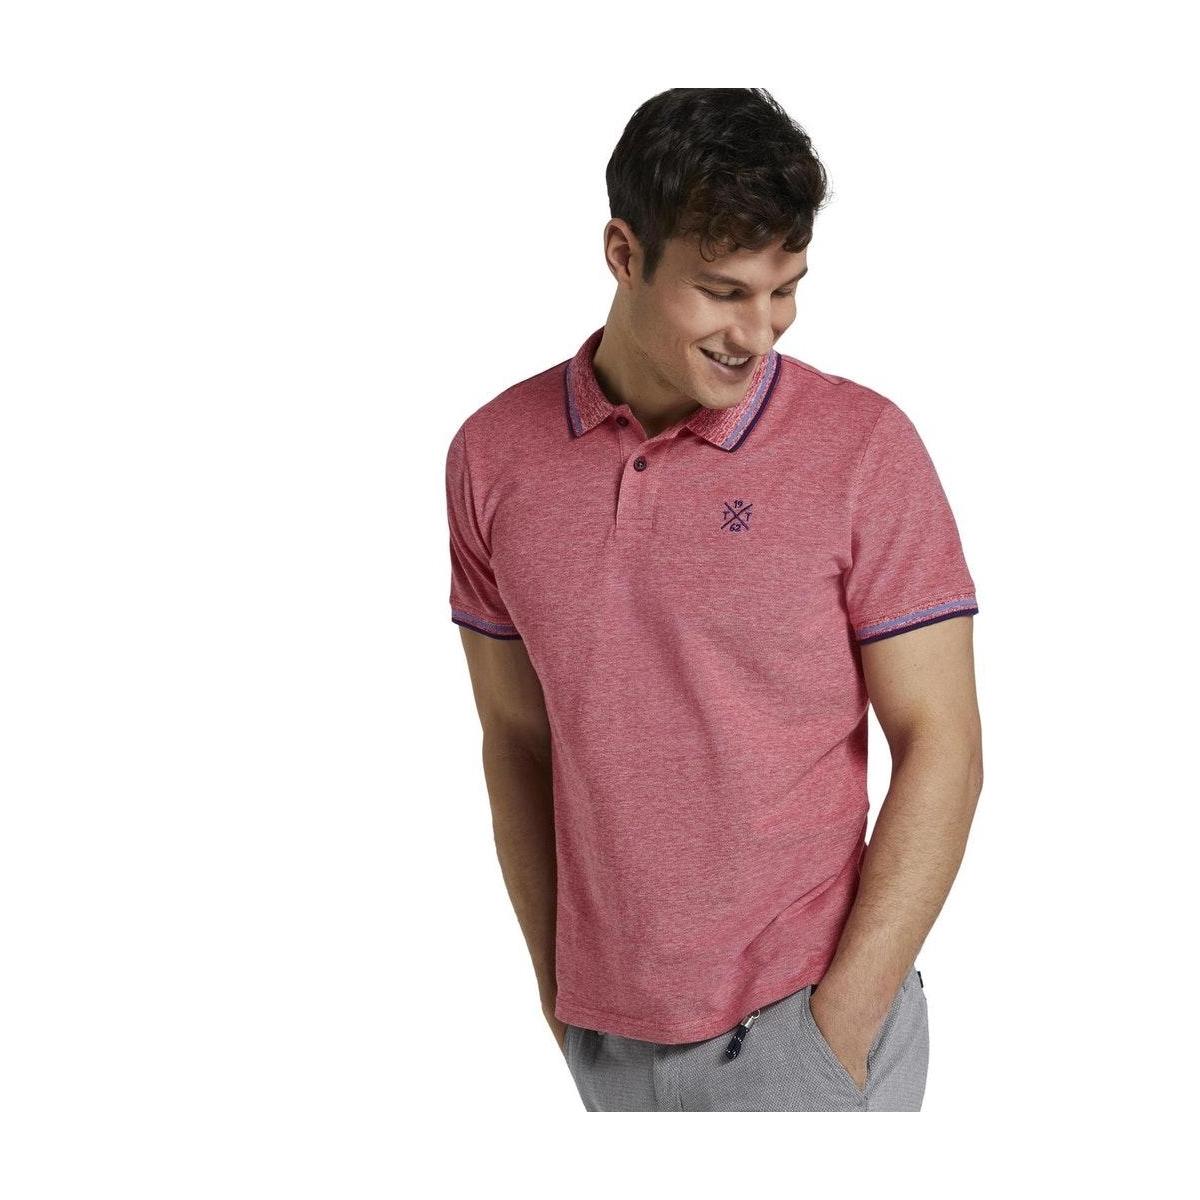 tweekleurige polo hemd 1016150xx10 tom tailor polo 21334